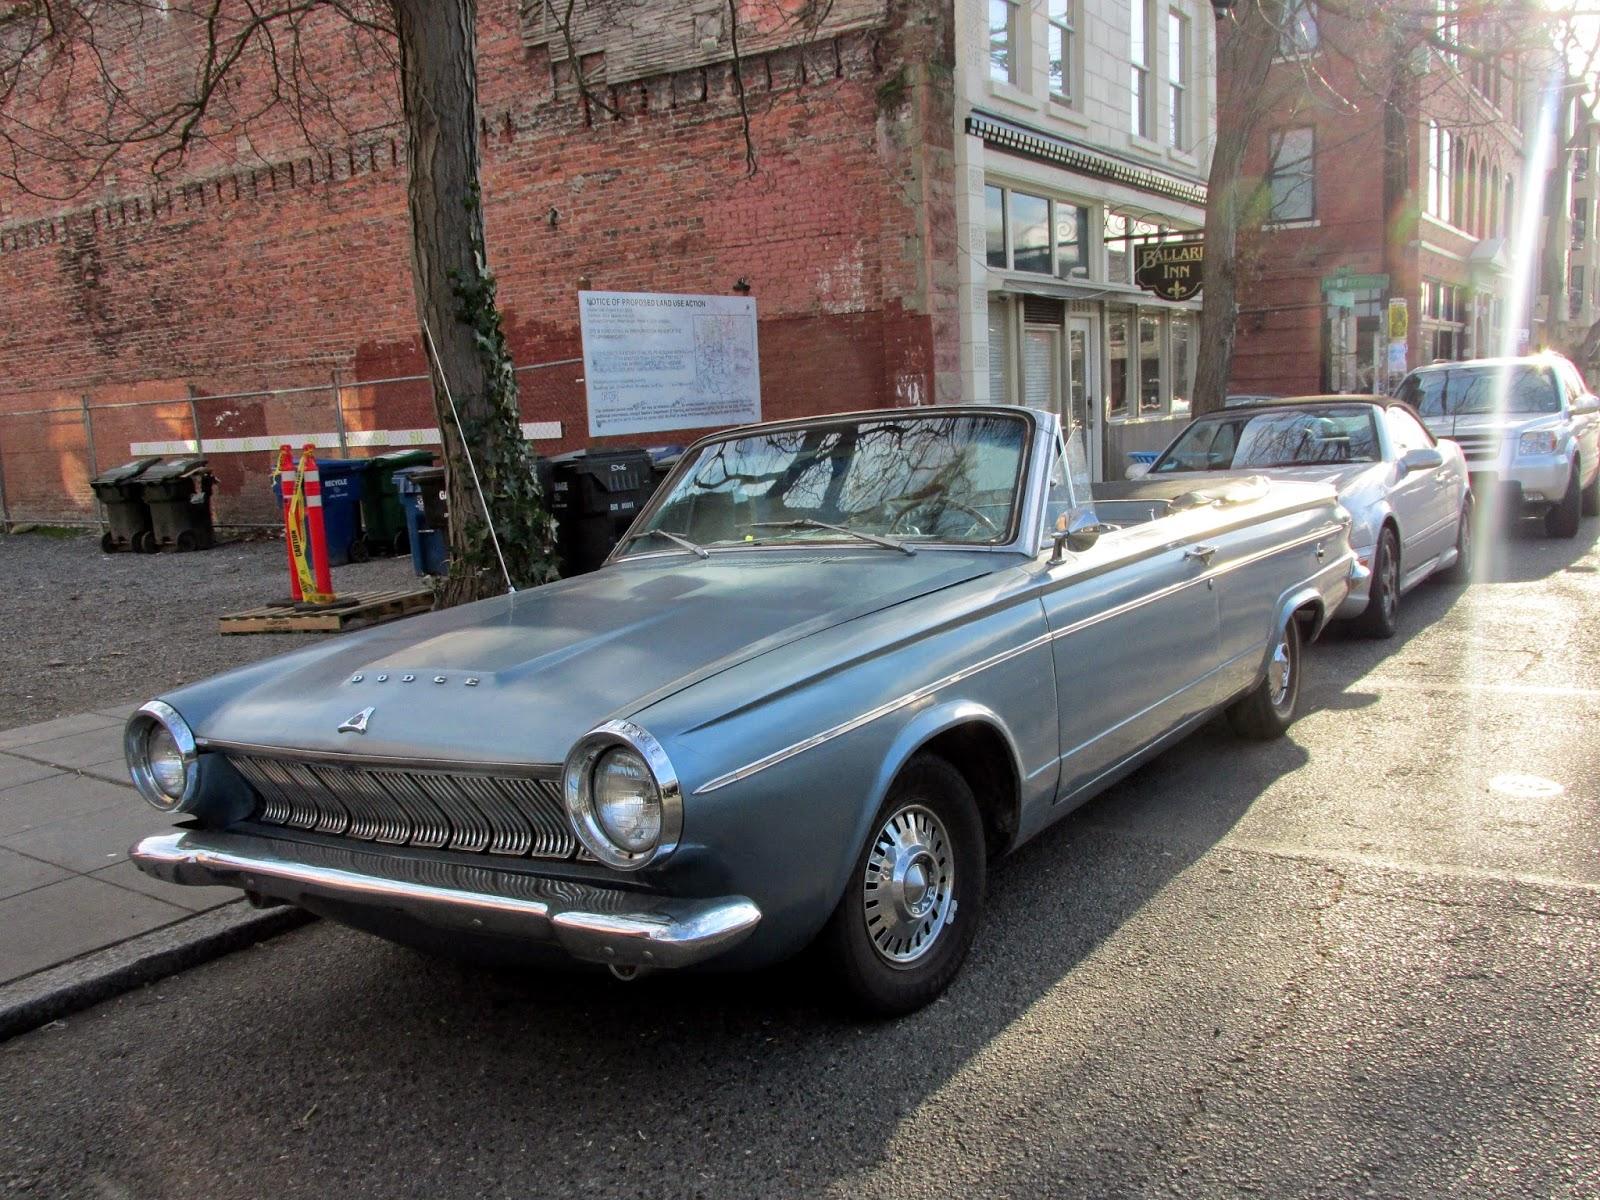 Seattle's Classics: 1963 Dodge Dart Convertible